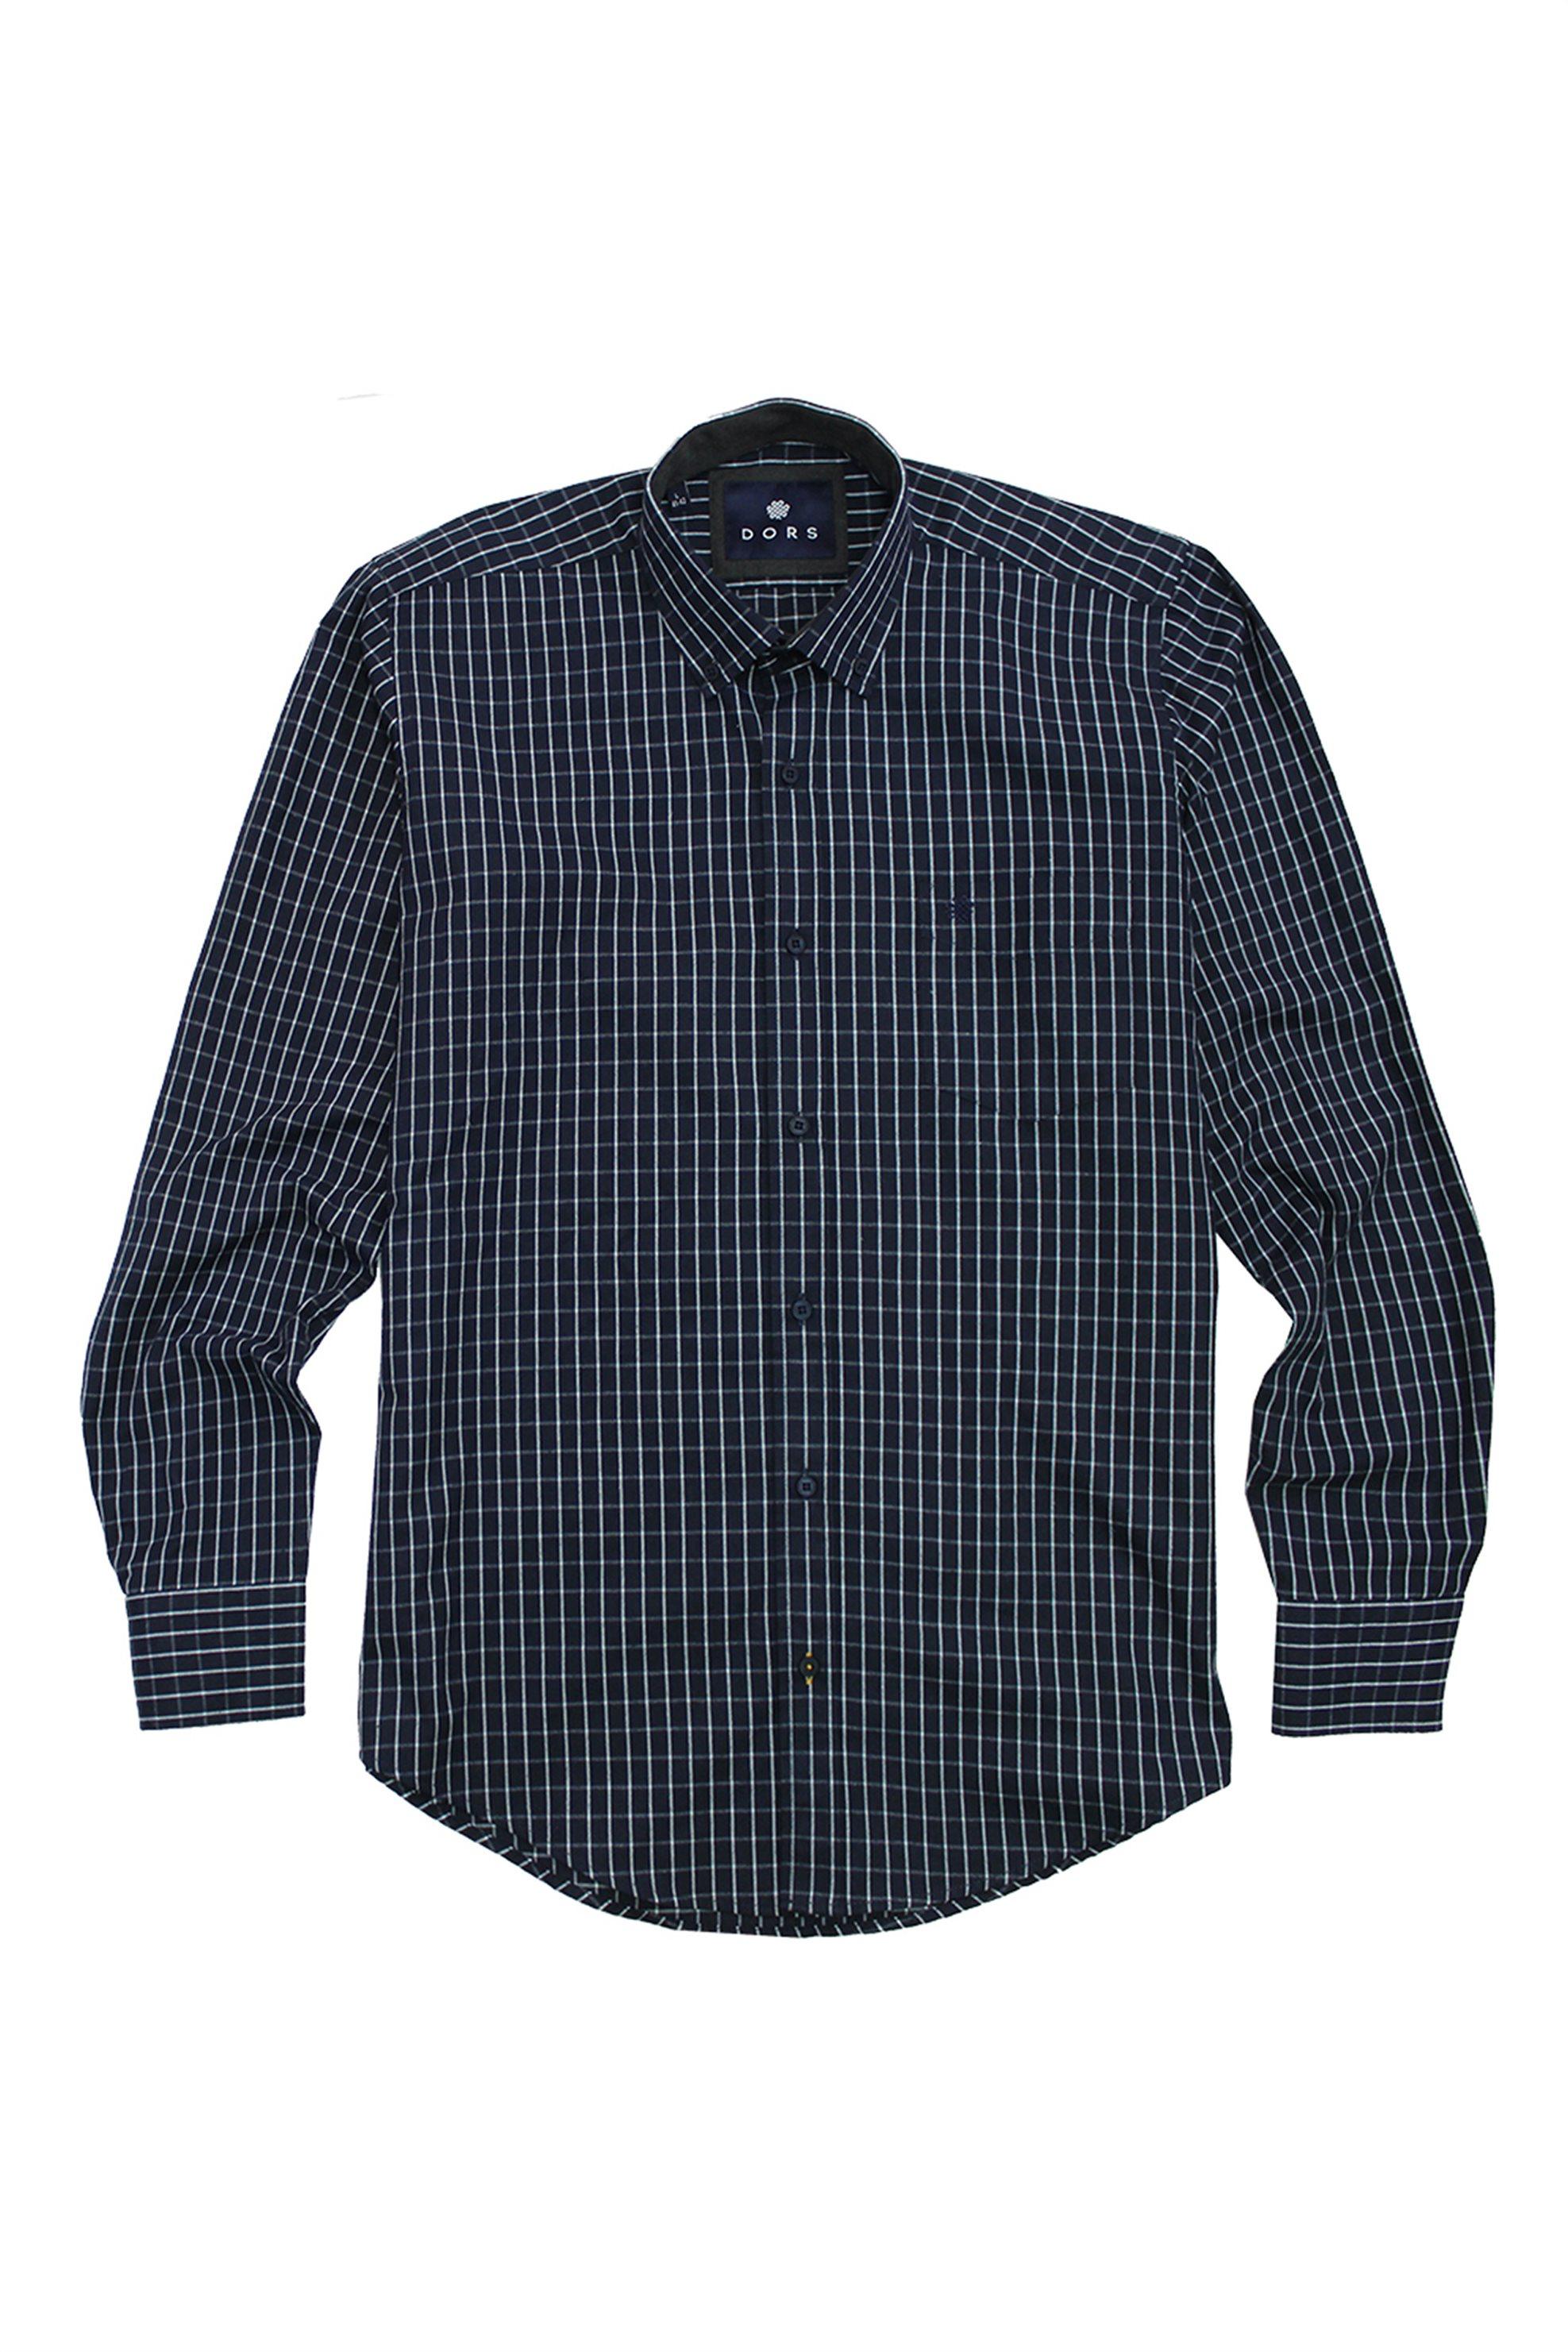 DORS ανδρικό καρό πουκάμισο με τσέπη και κεντημένο λογότυπο - 1029028.C01 - Μπλε Σκούρο